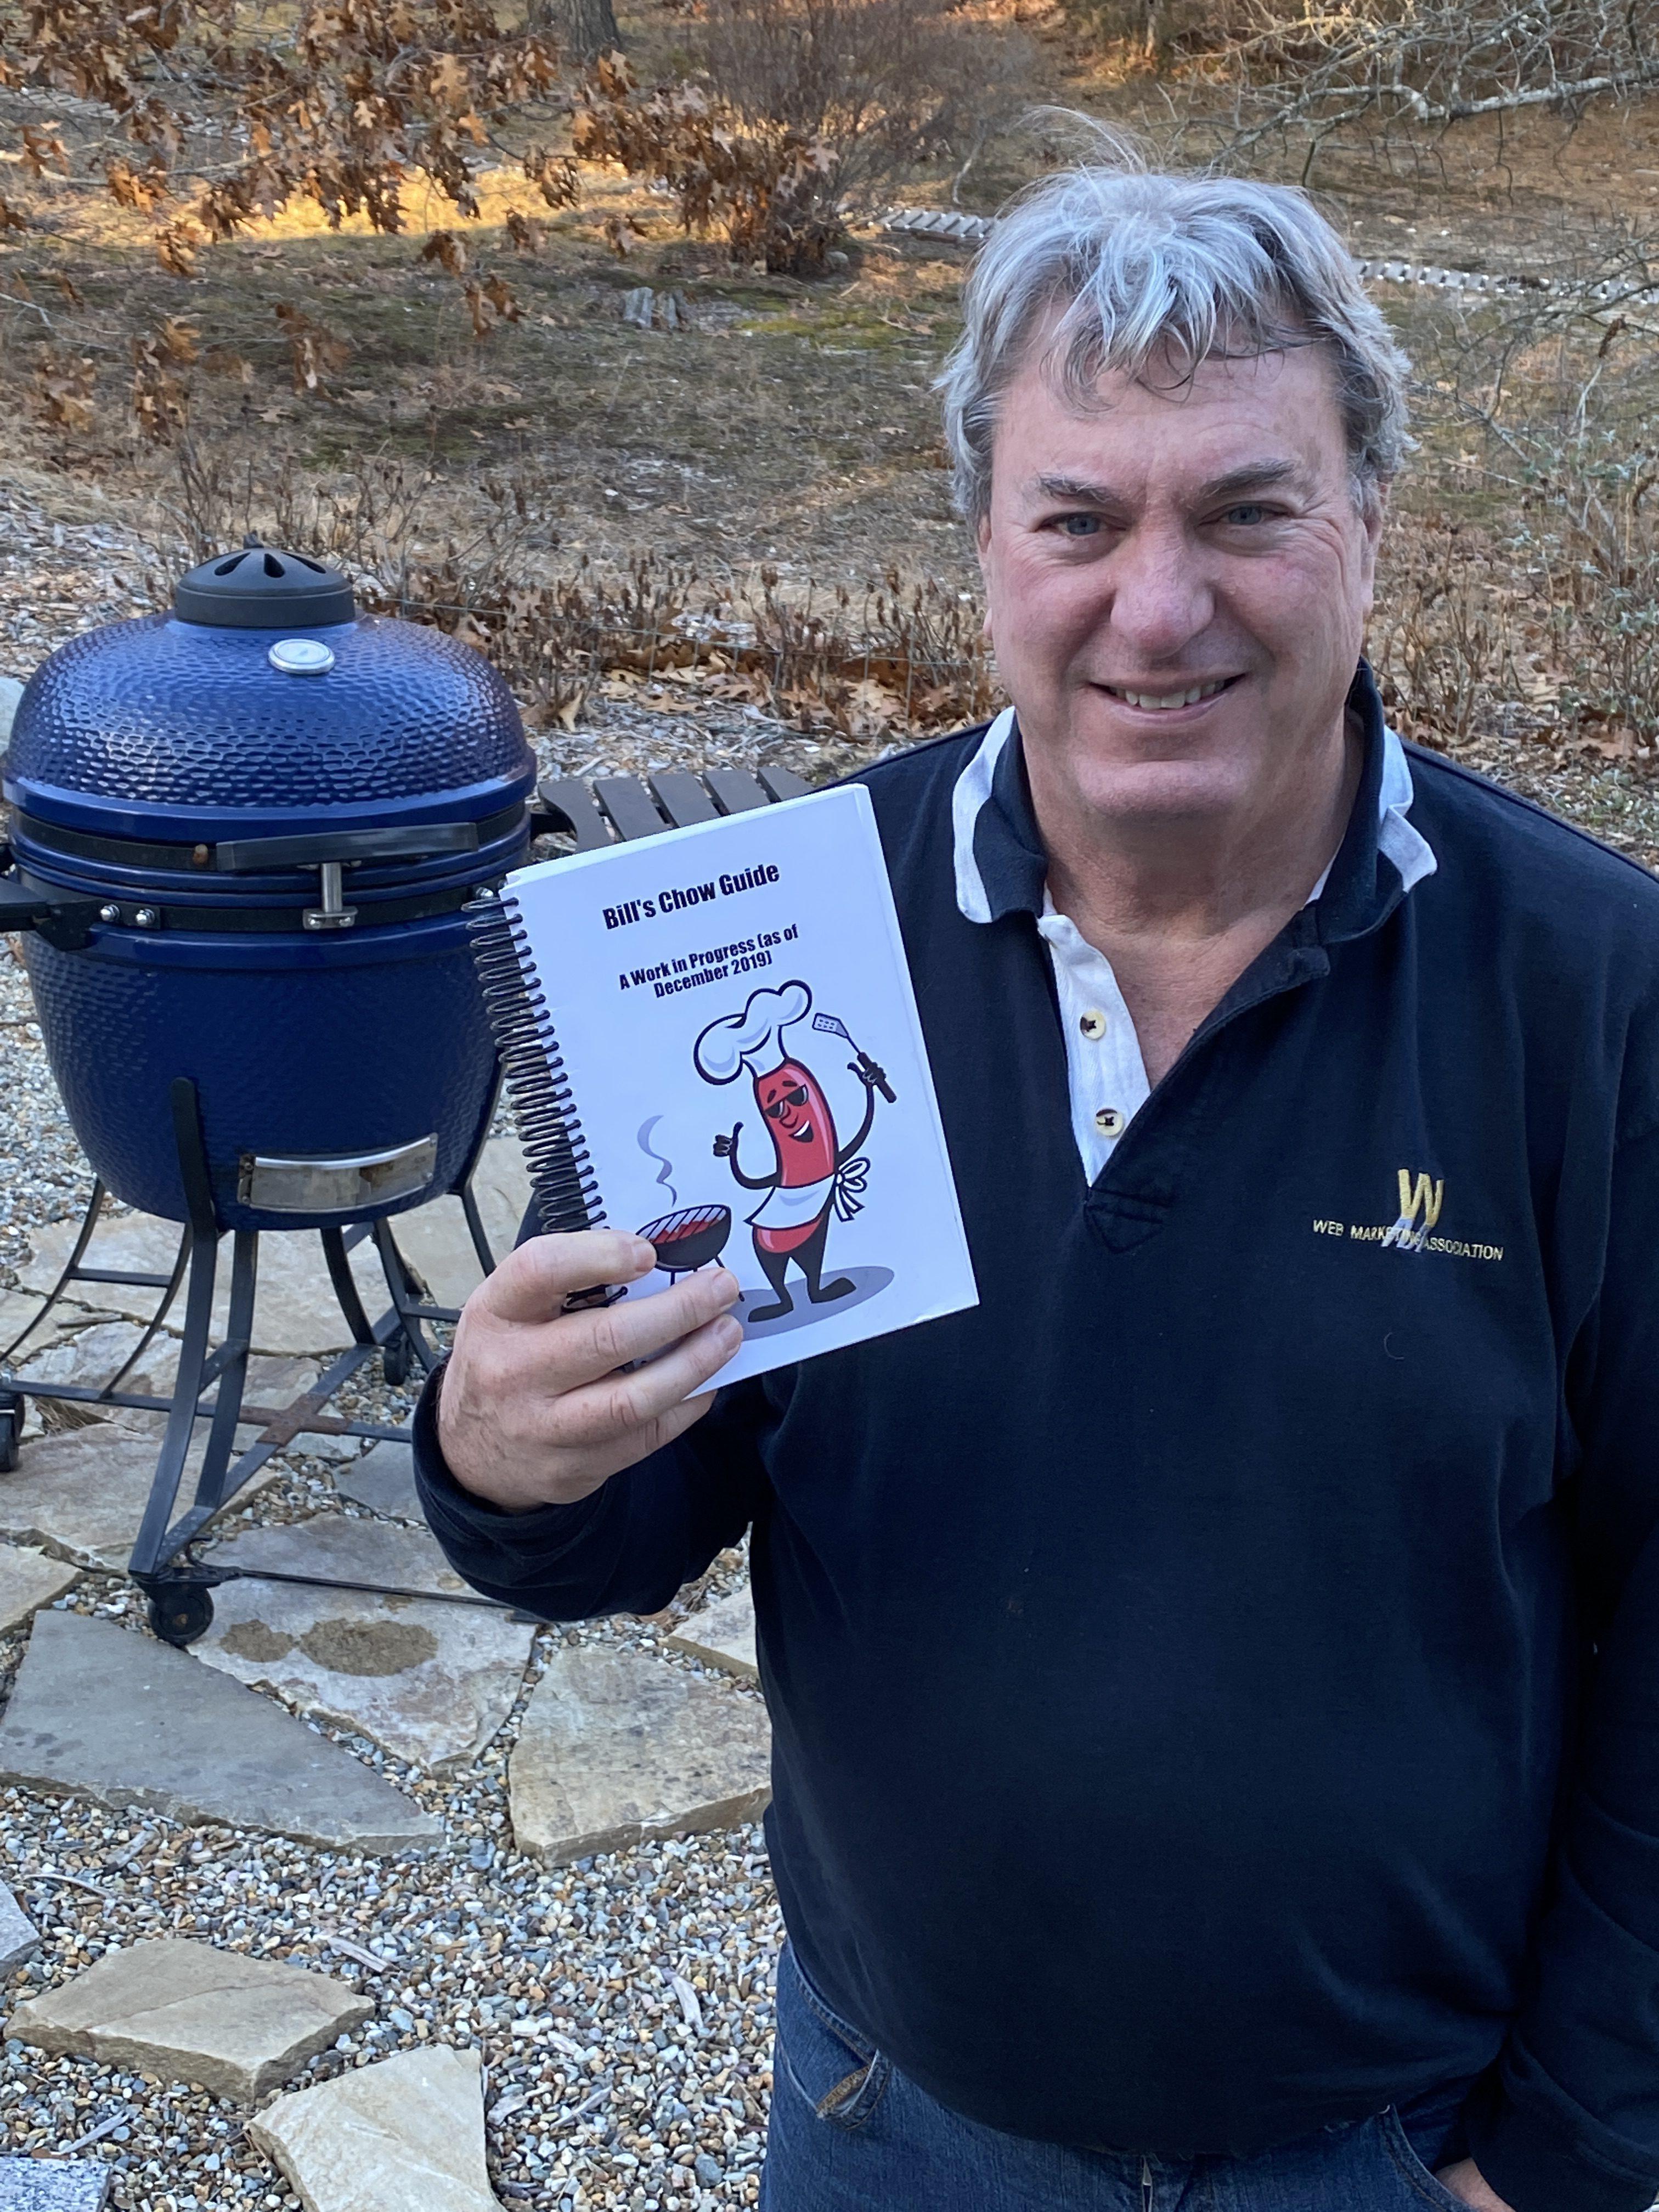 600 BBQ Recipes